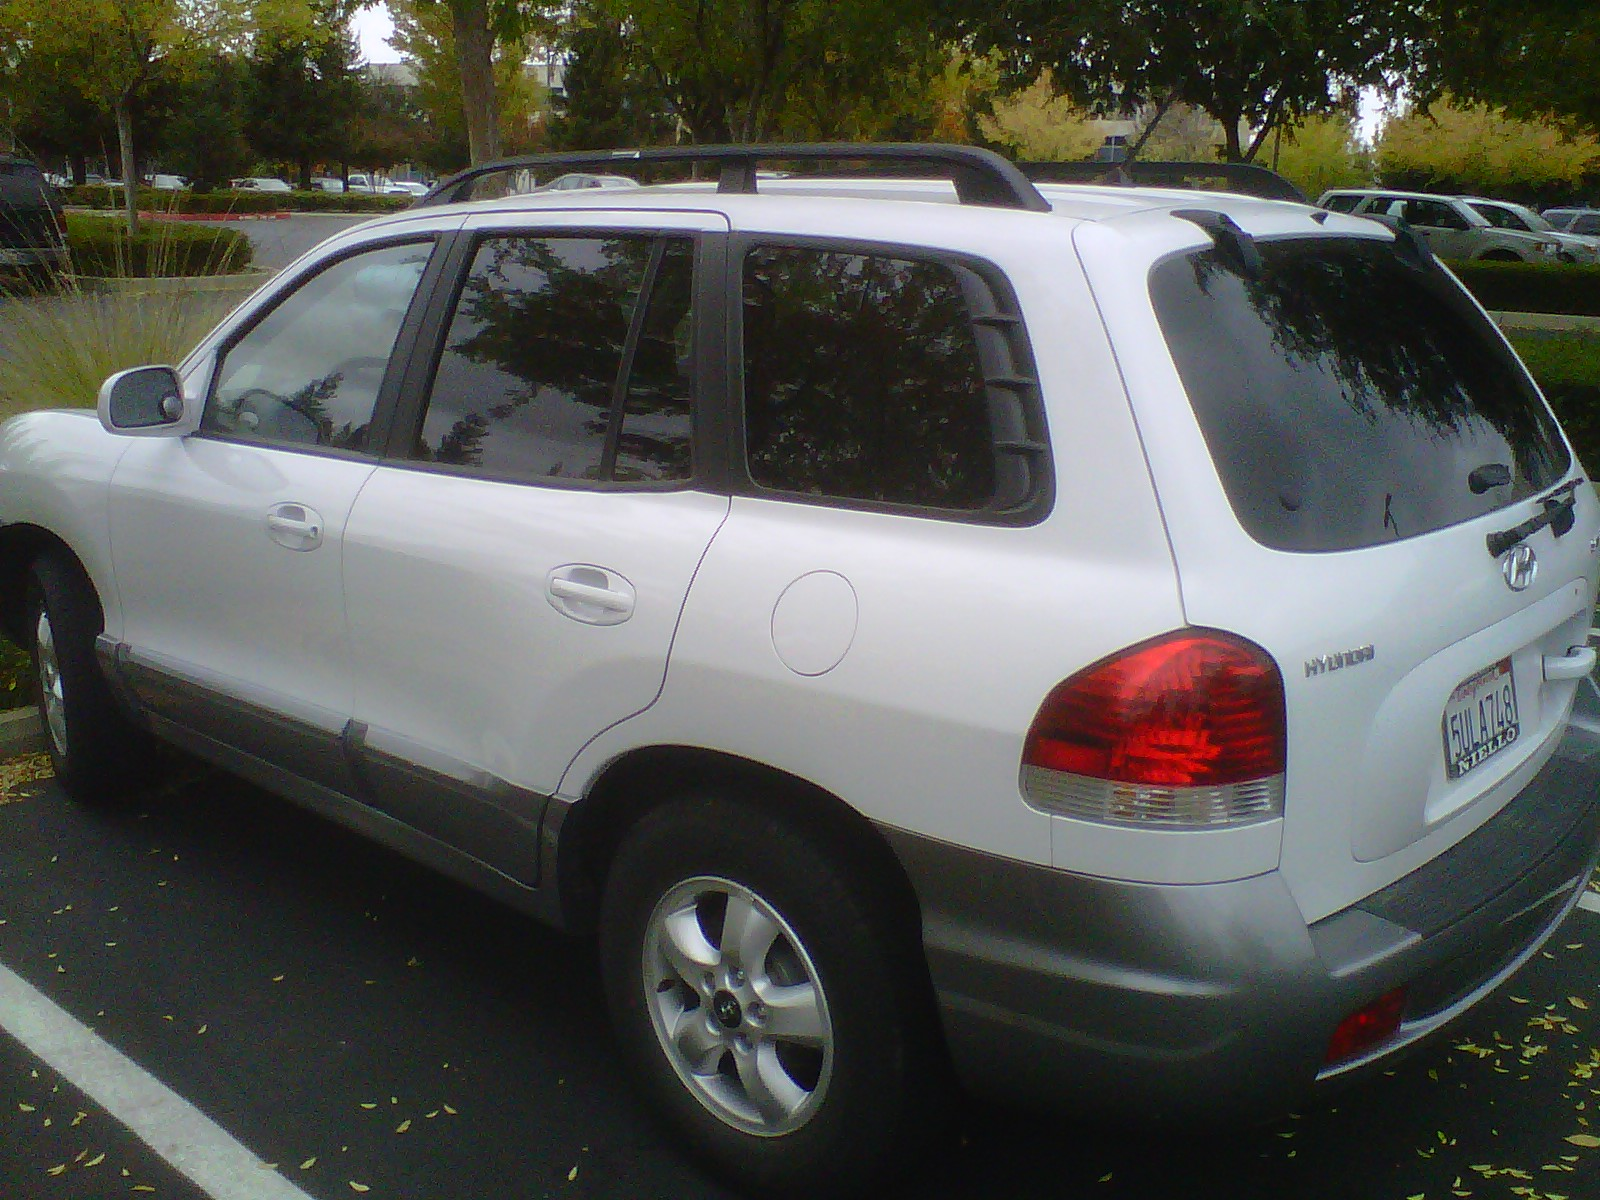 2006 Hyundai Santa Fe - Pictures